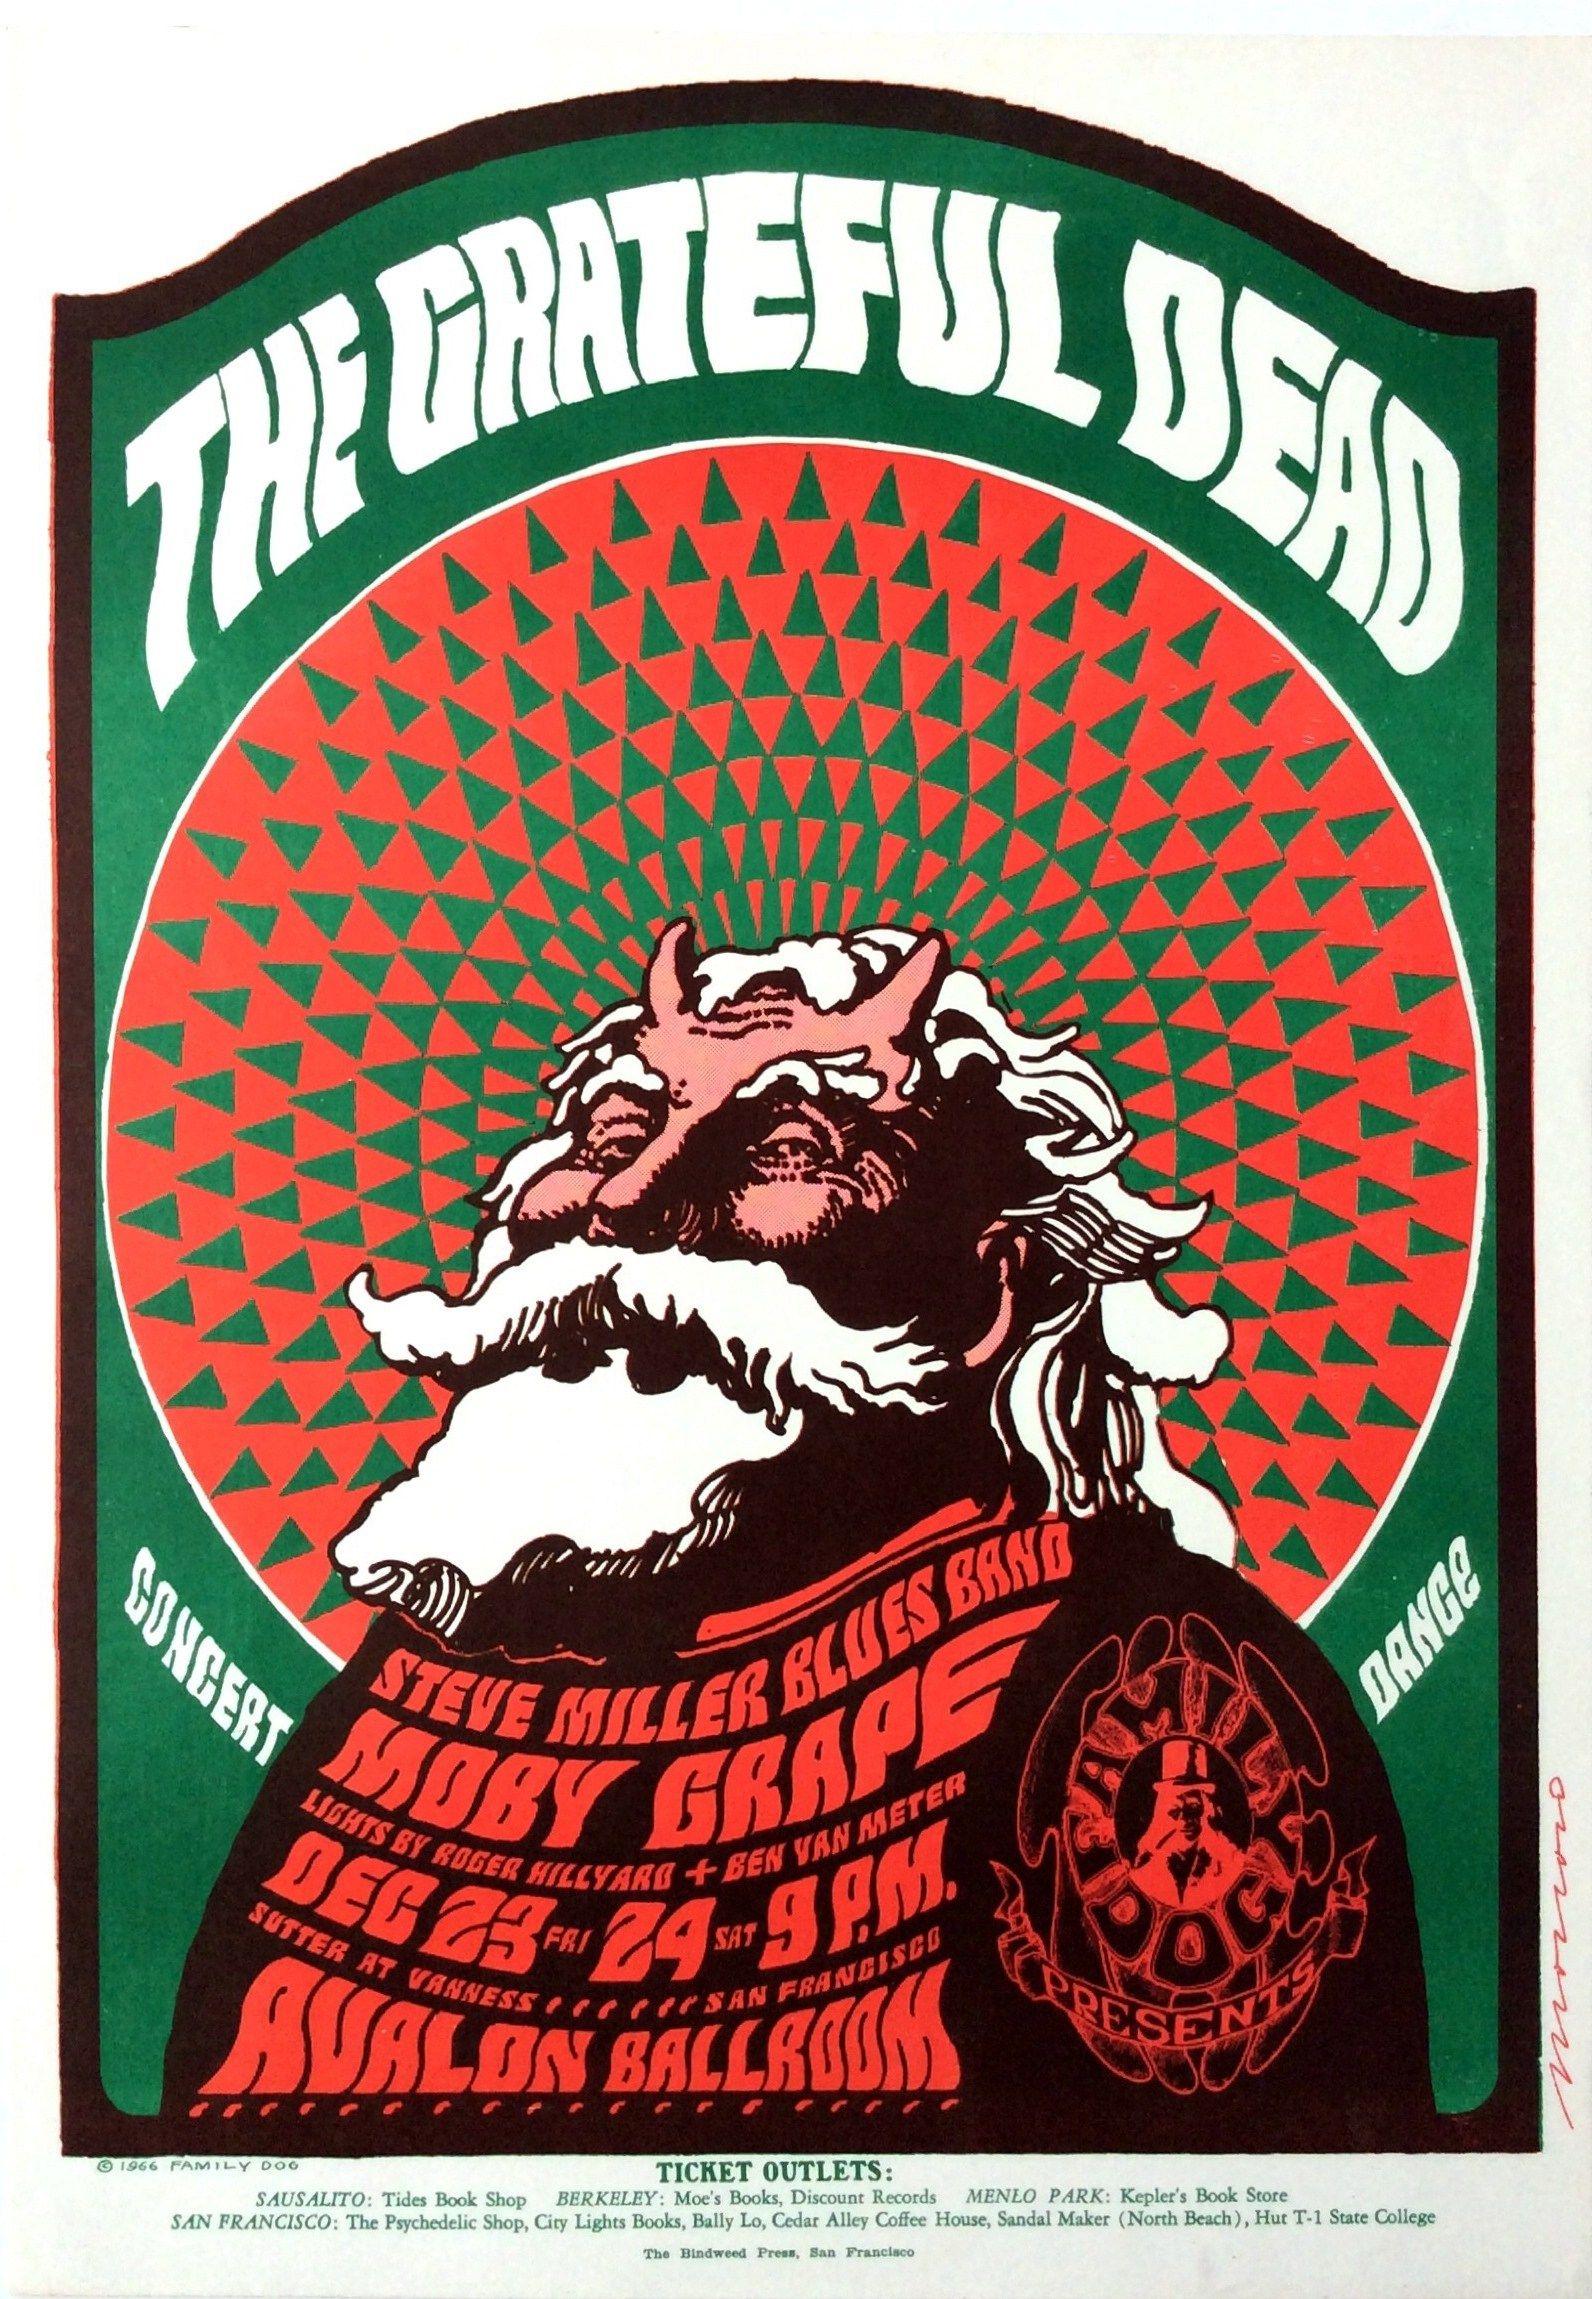 Fleetwood Mac Phillips Arena Vintage Concert Design Reproduction Poster